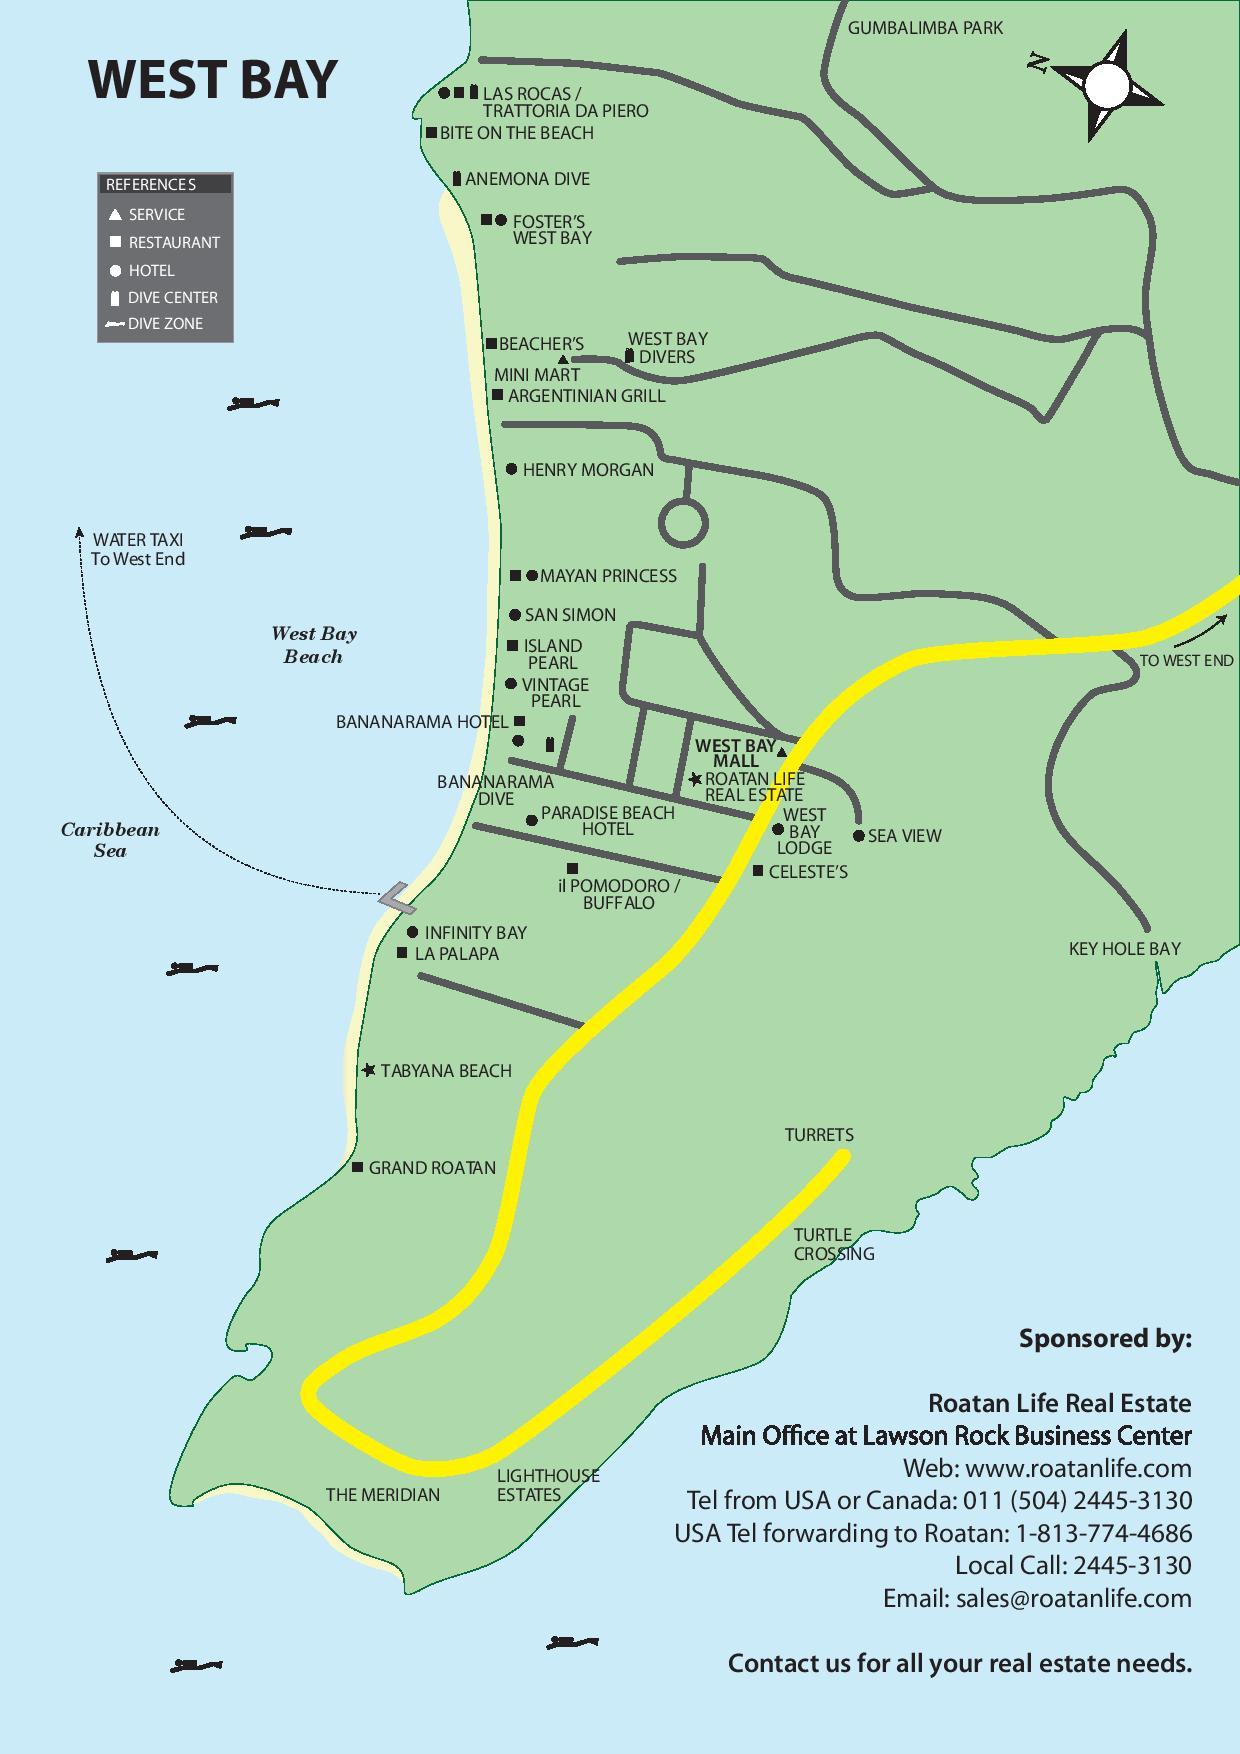 West Bay Roatan map from Roatan Life Real Estate